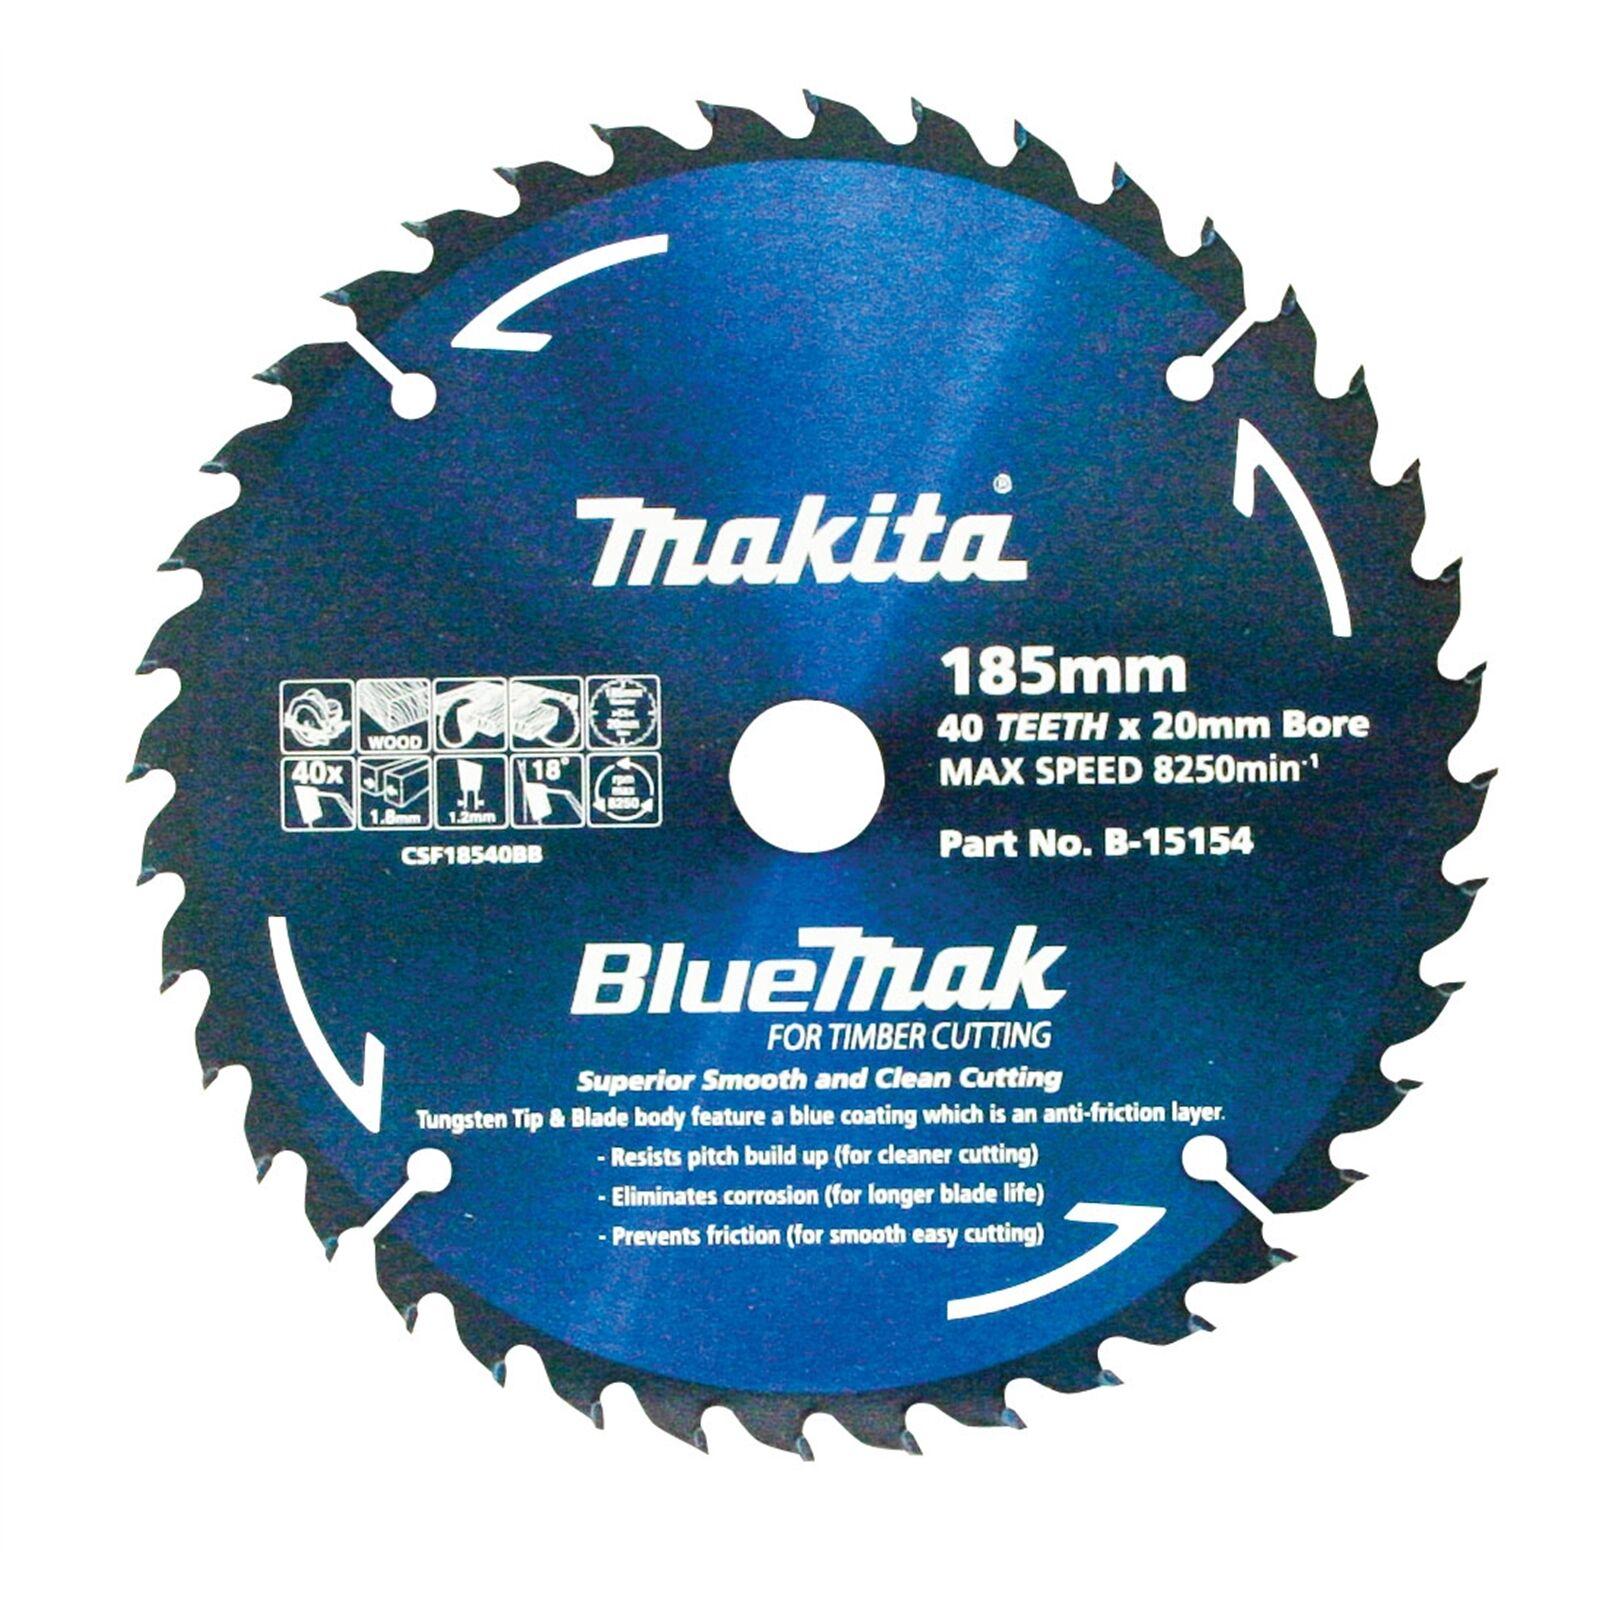 Makita BlauMAK CIRCULAR SAW BLADE 40 Teeth Smooth & Clean Cutting-185mm or 235mm